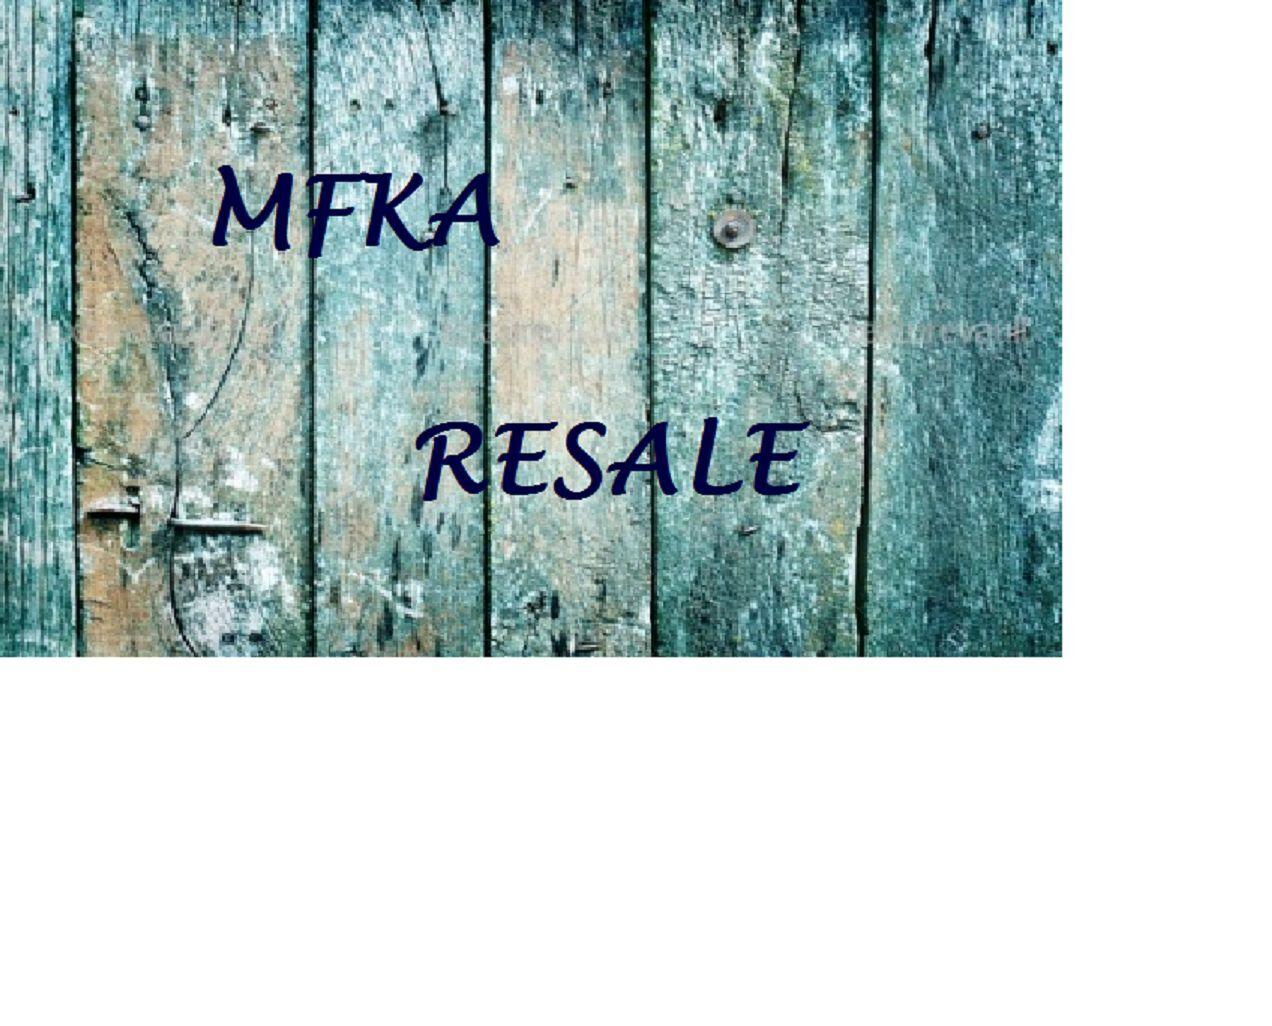 MFKA_RESALE